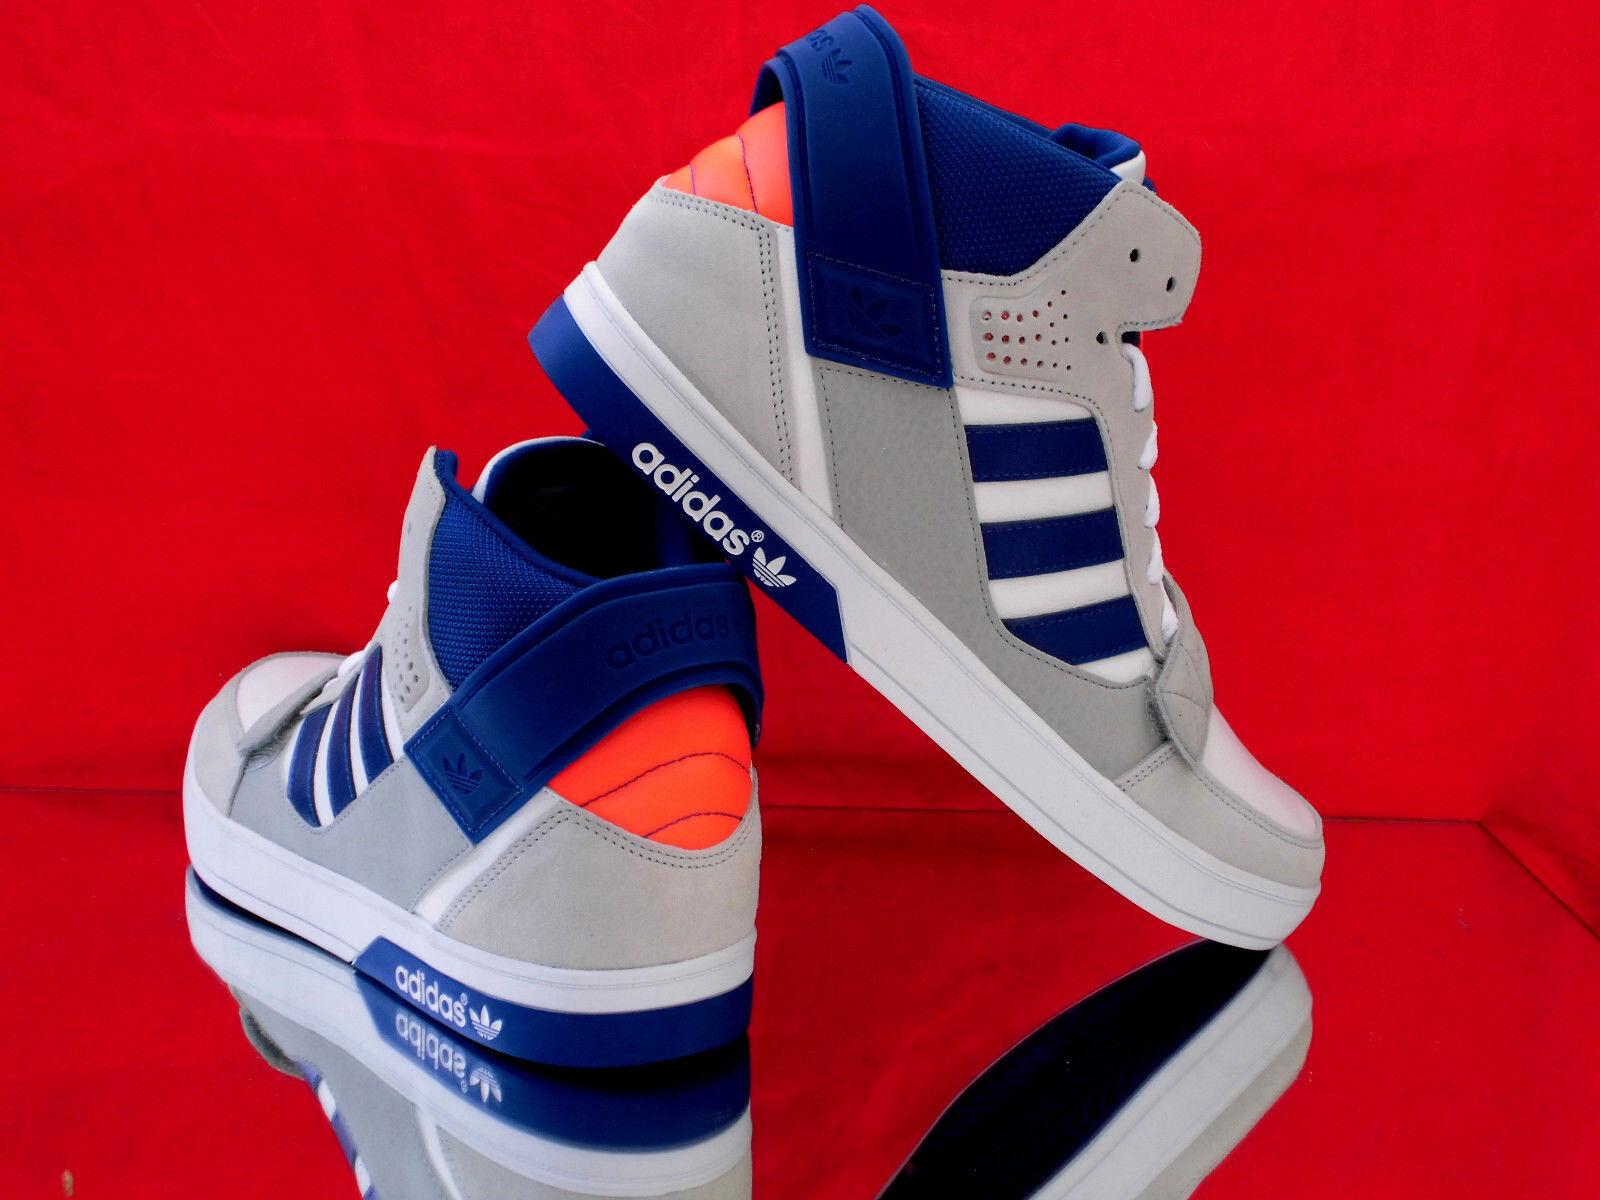 ADIDAS Originals Hardcourt Q22070 Defender Higt-Top Sneaker Weiß/grau/blau Q22070 Hardcourt Neu 9df496